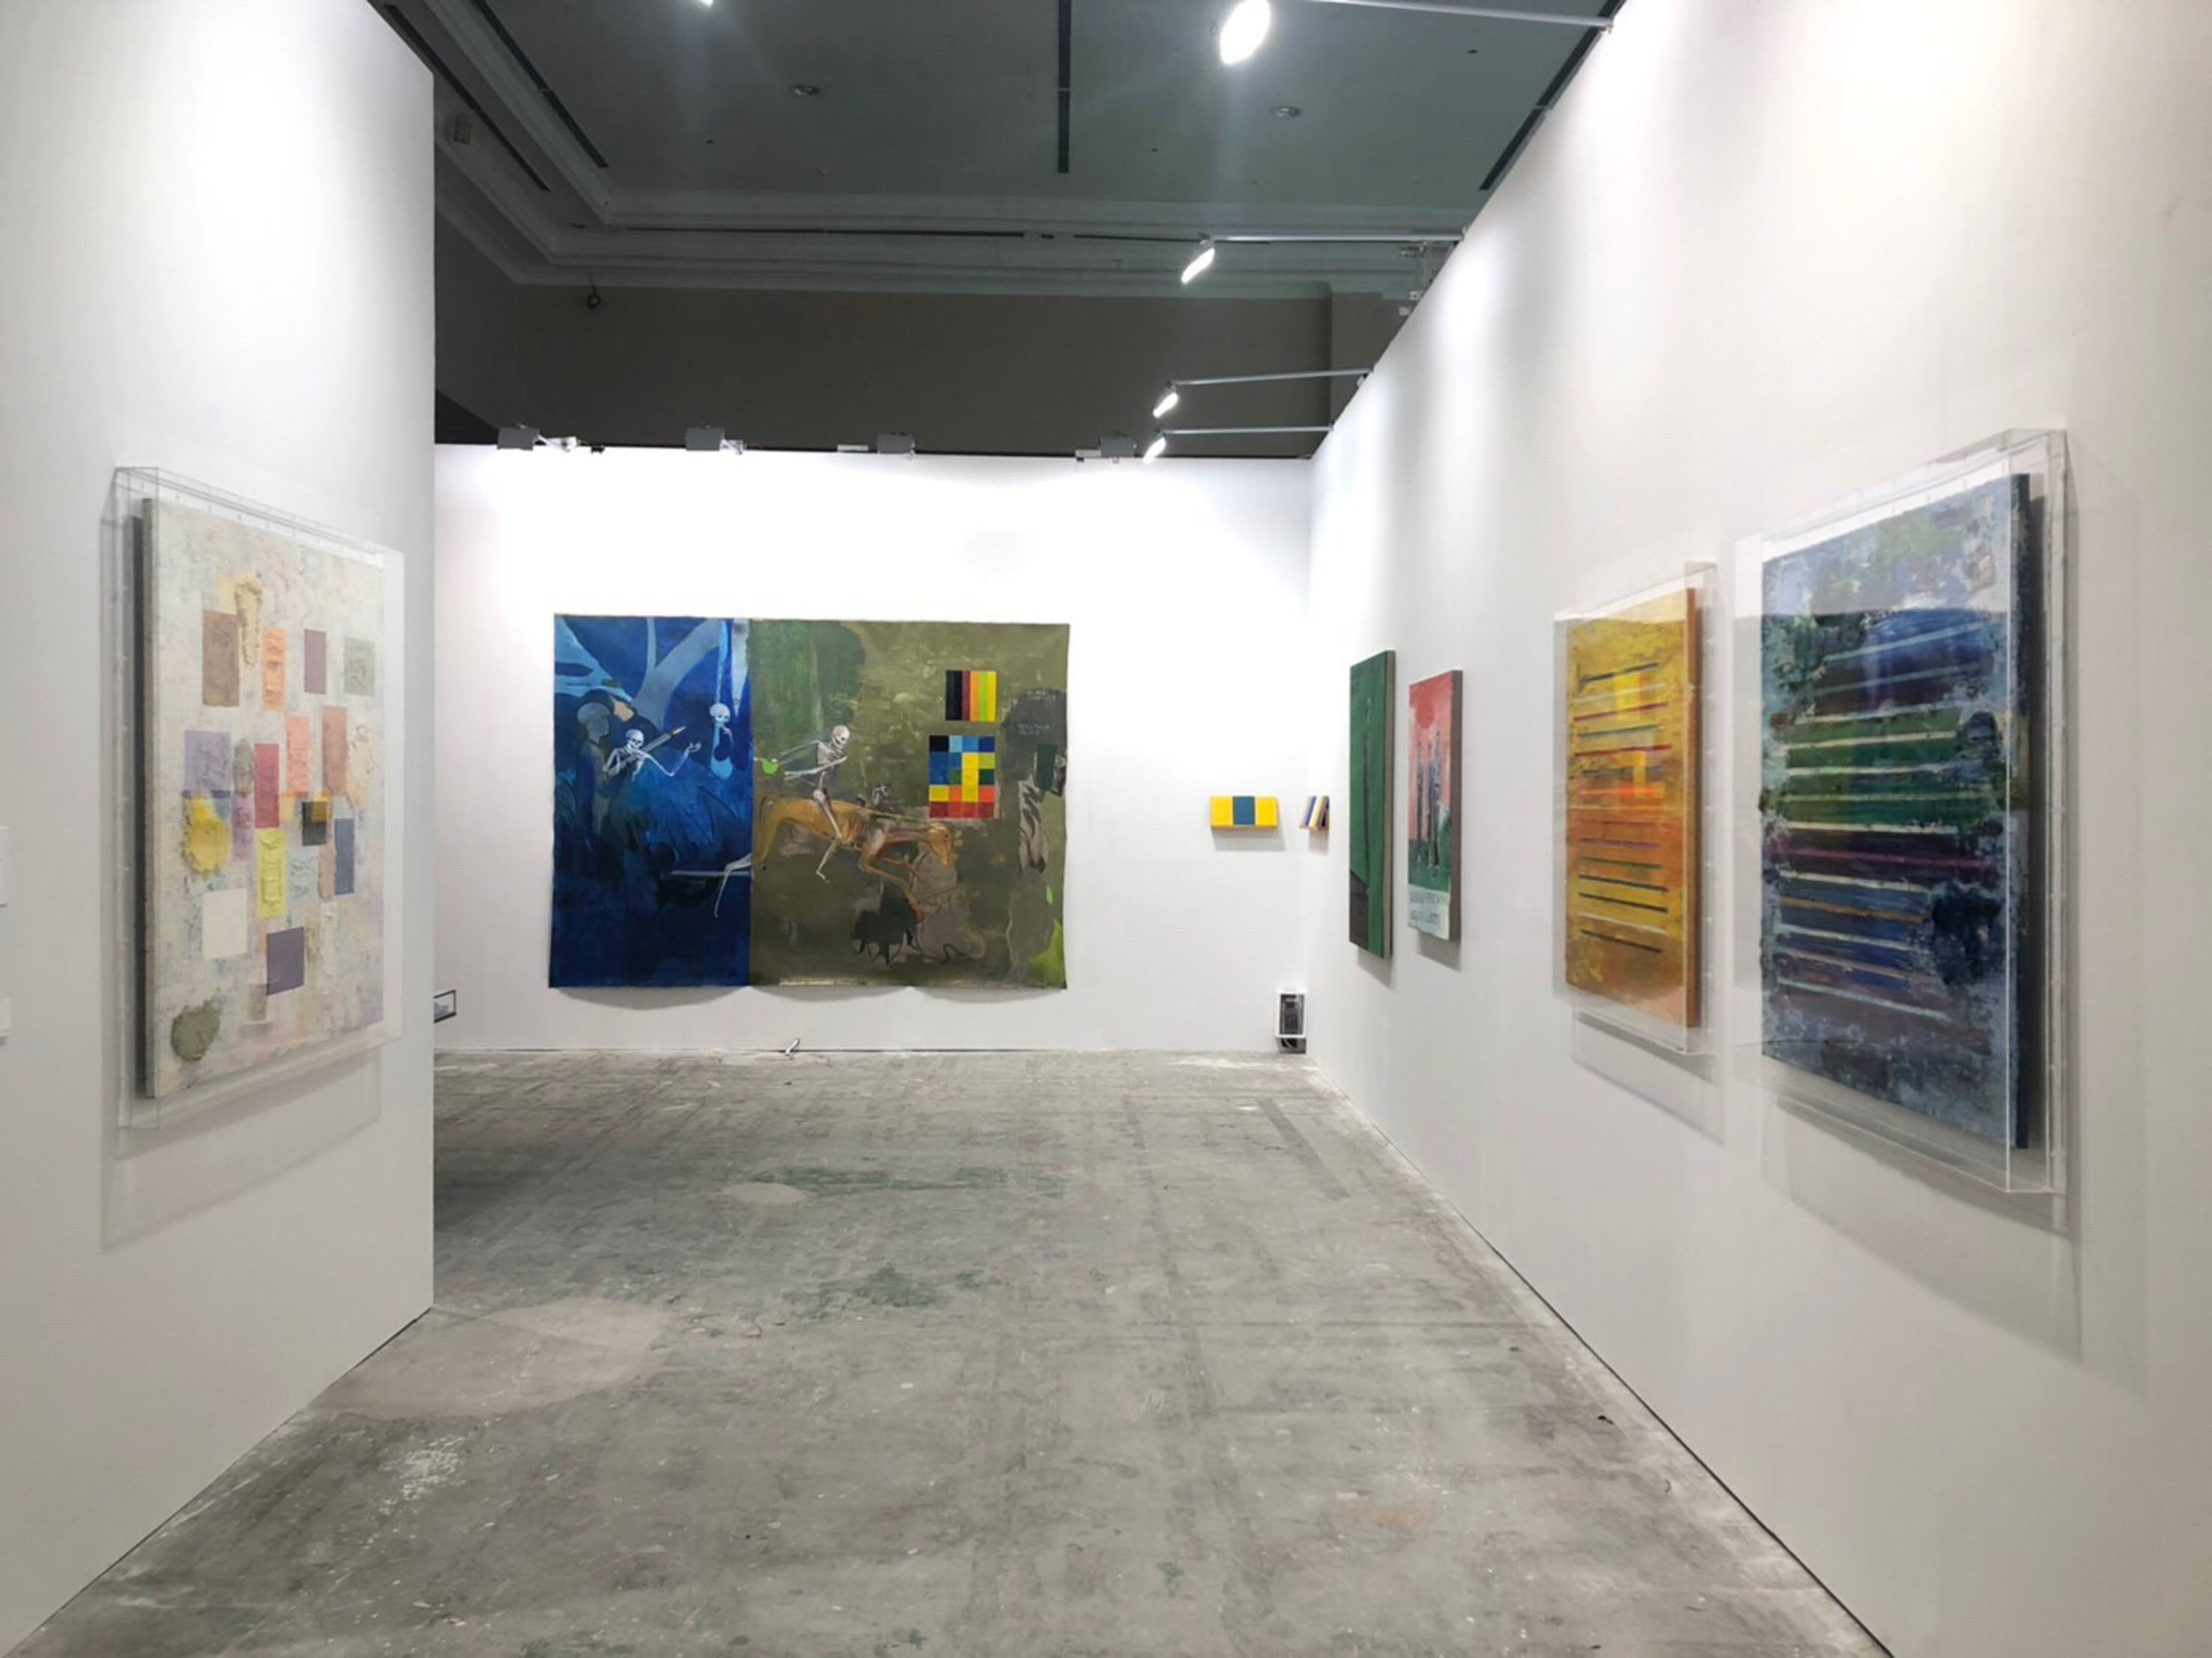 TKG+ booth, featuring works by Mit Jai Inn and Sawangwongse Yawnghwe. Image courtesy of TKG+.